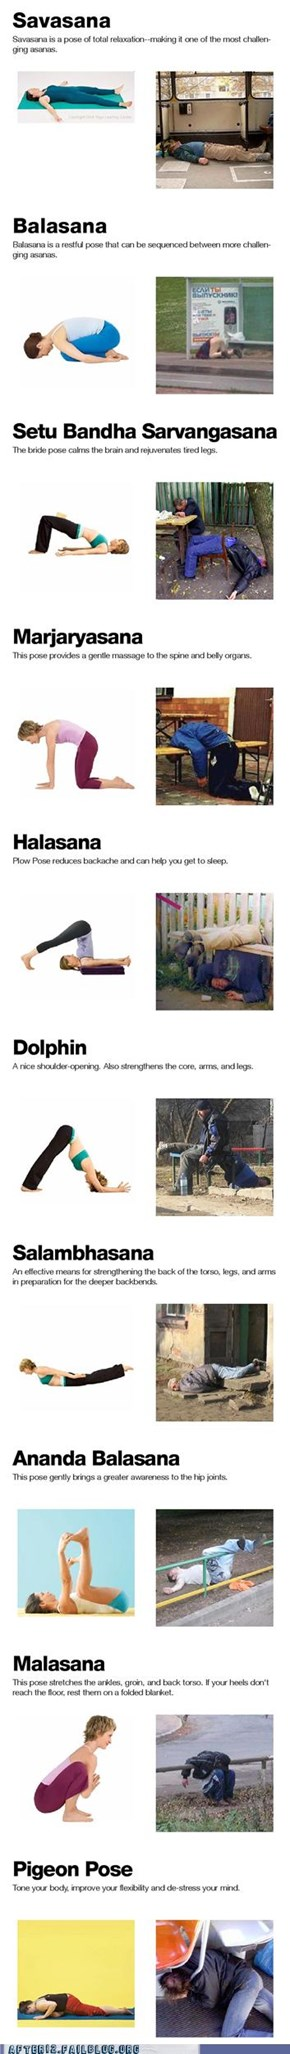 Drunk Yoga Chart